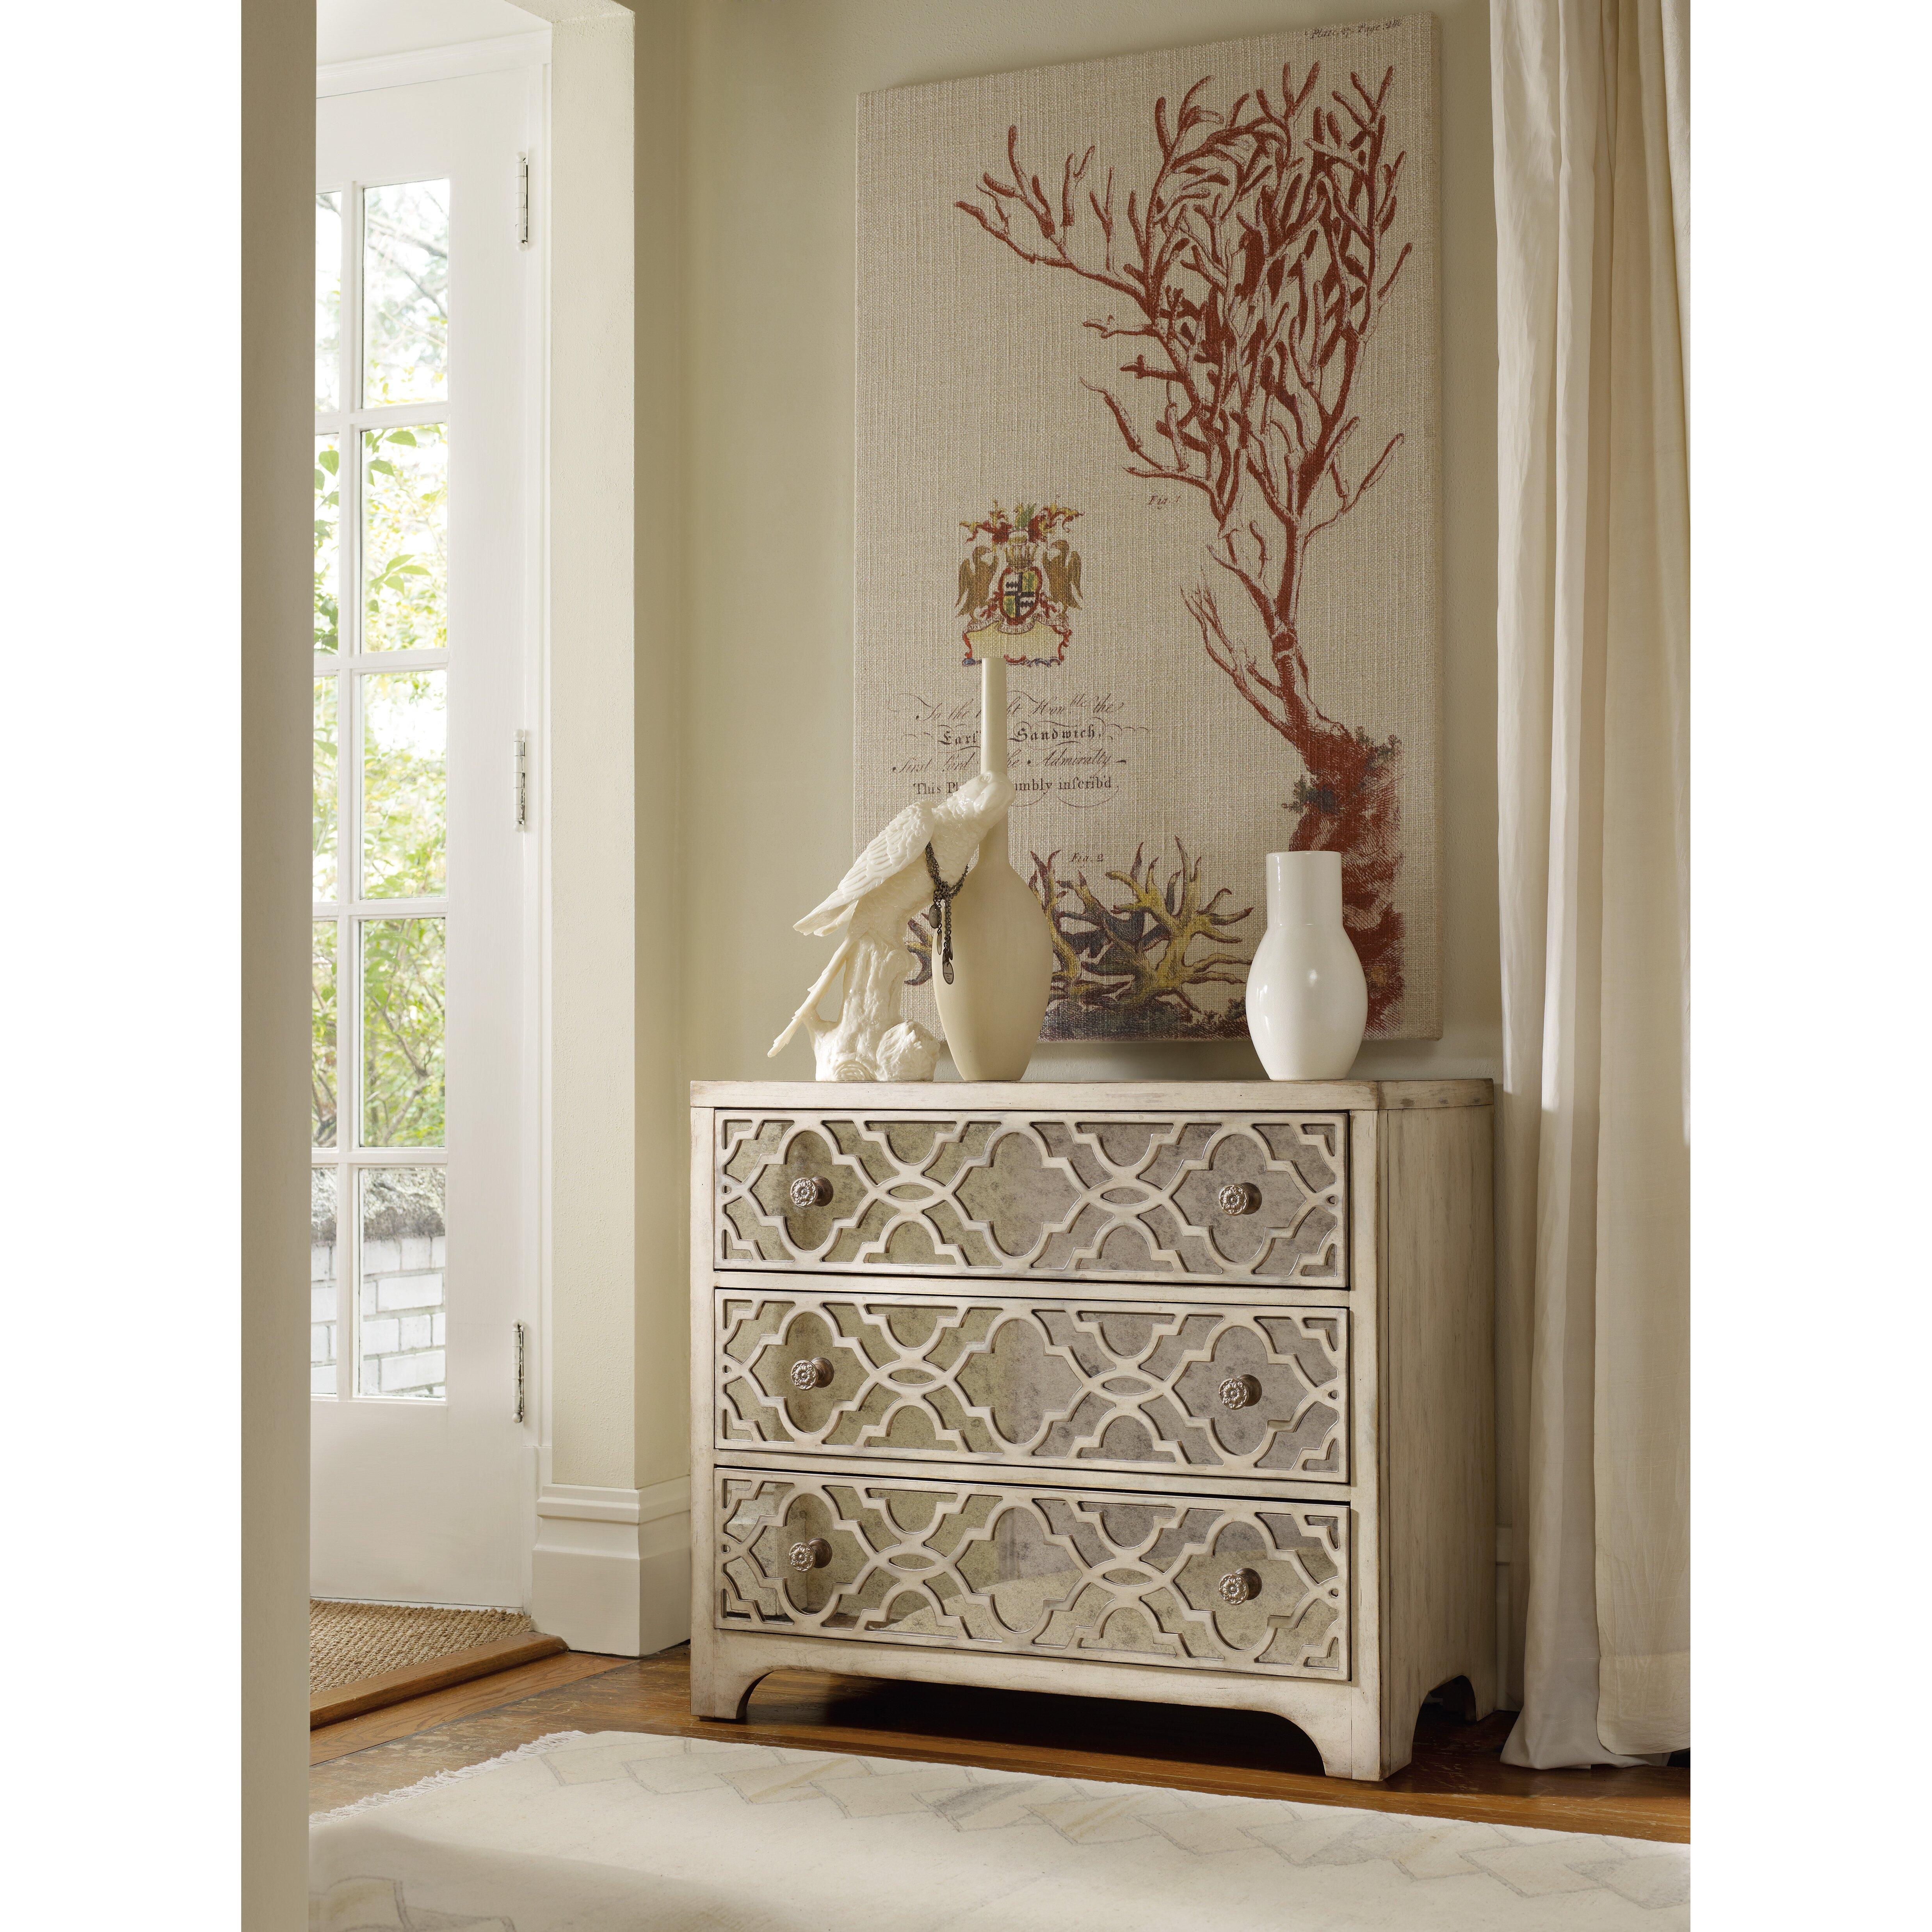 Hooker Furniture Sanctuary 3 Drawer Fretwork Chest